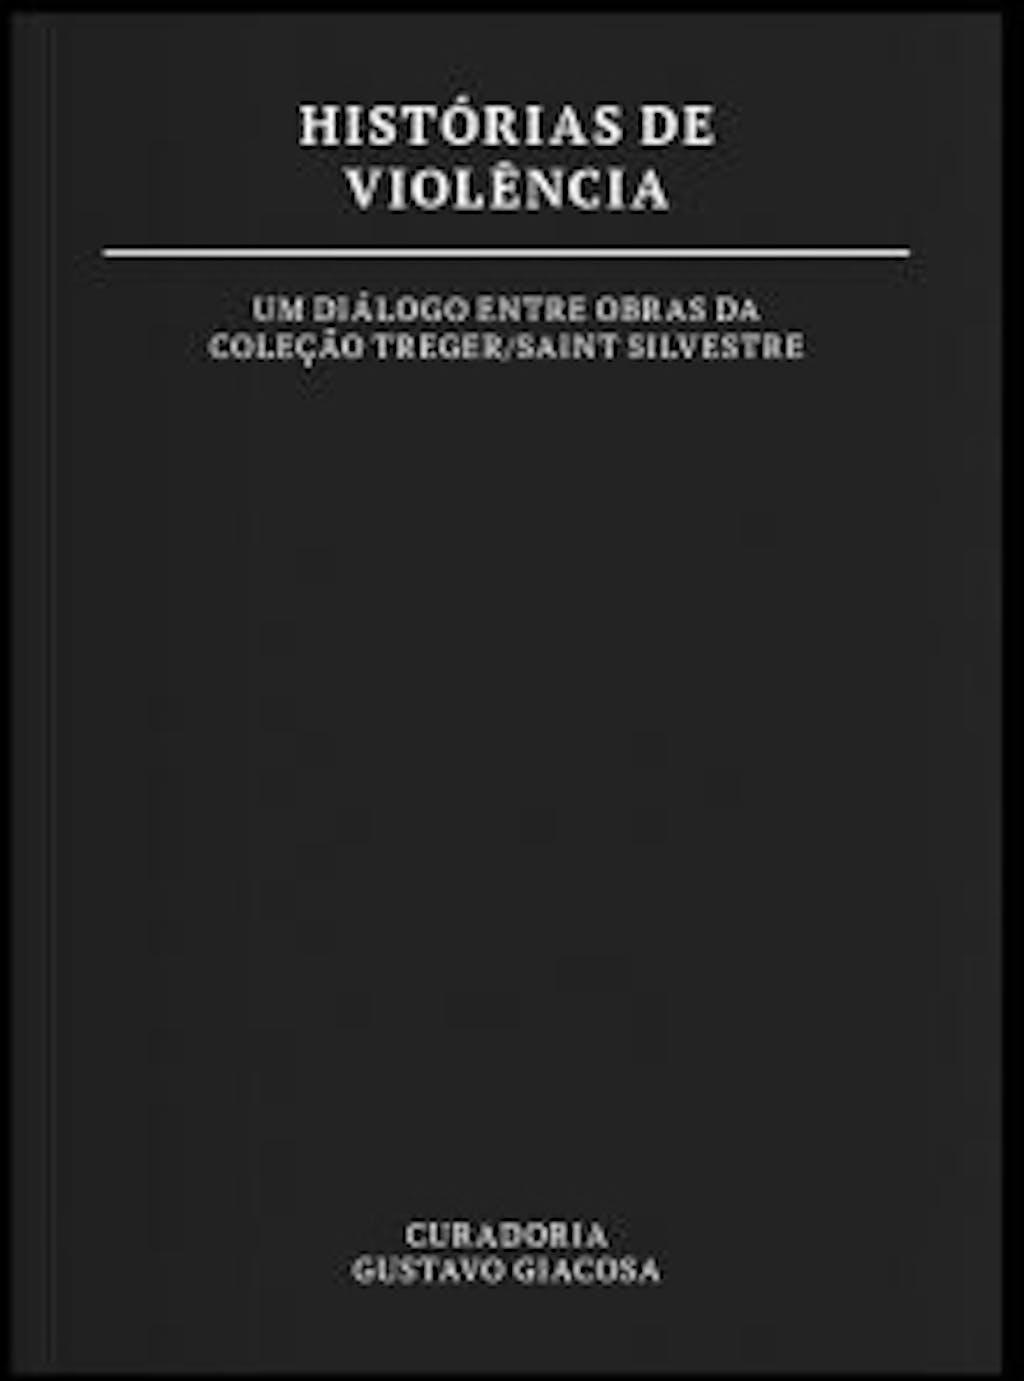 Historias de violencia - © christian berst — art brut